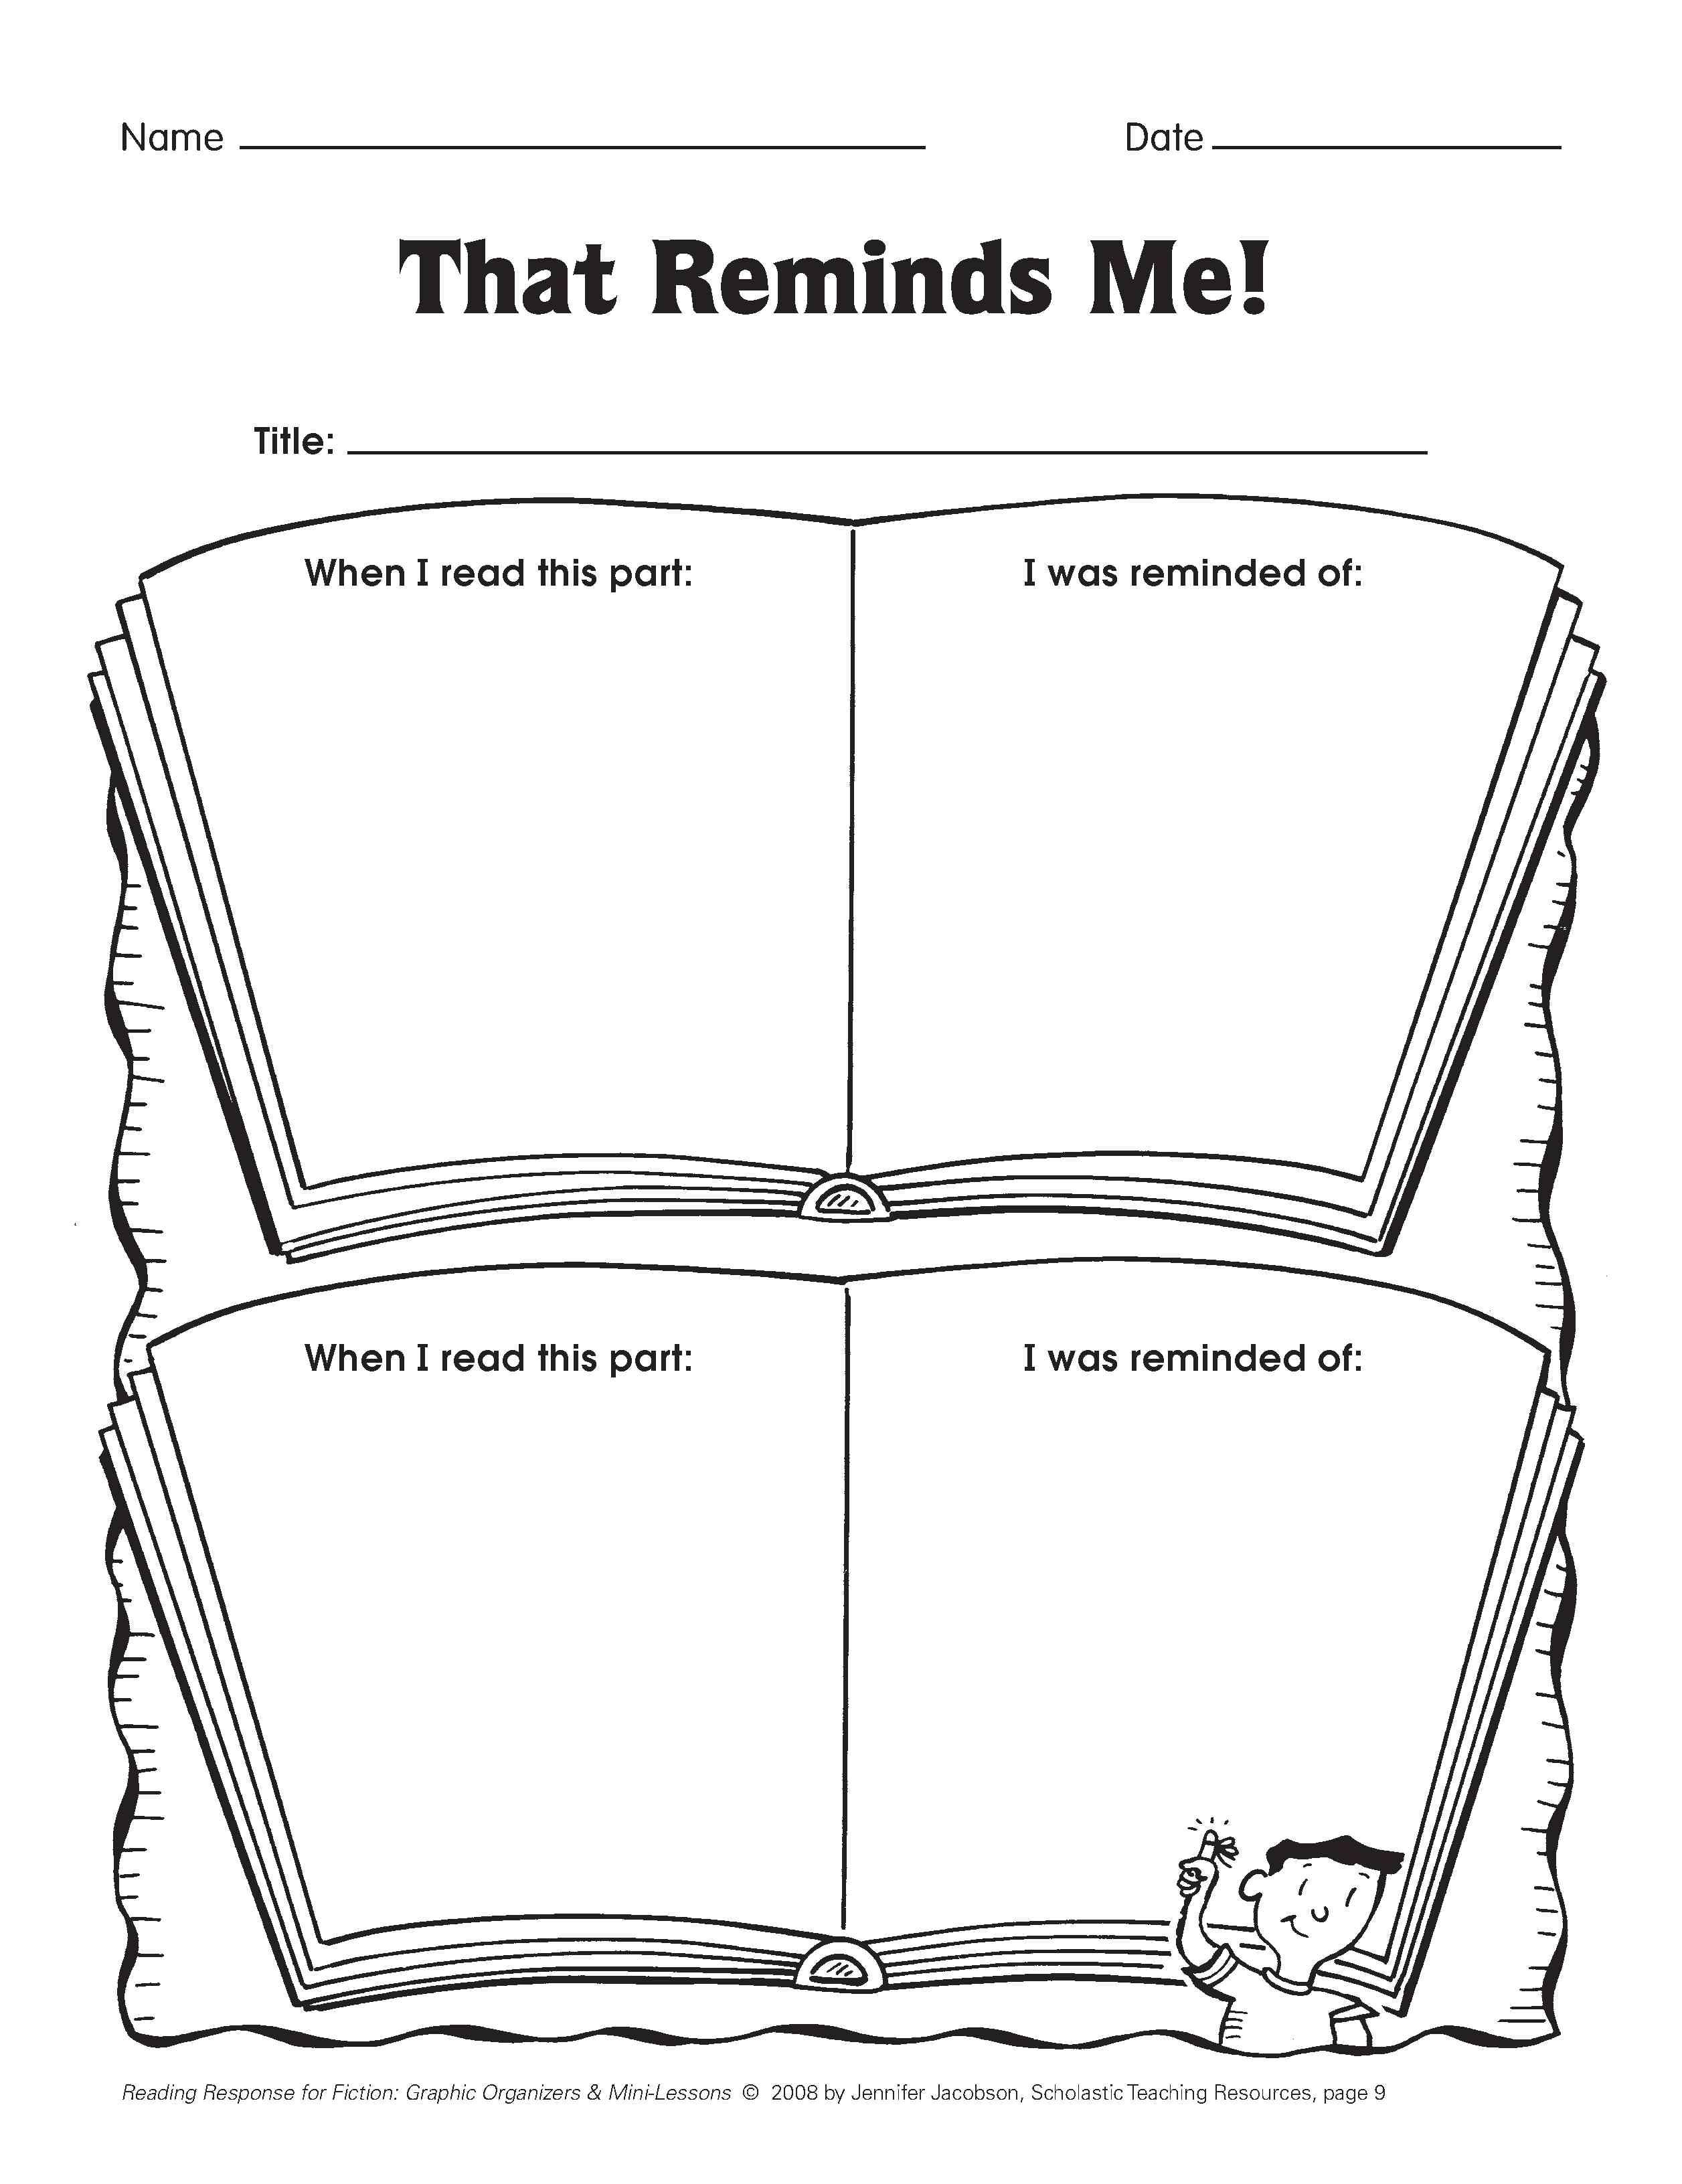 Five Minute Reading Responses | Scholastic - Free Printable Pre K Reading Books